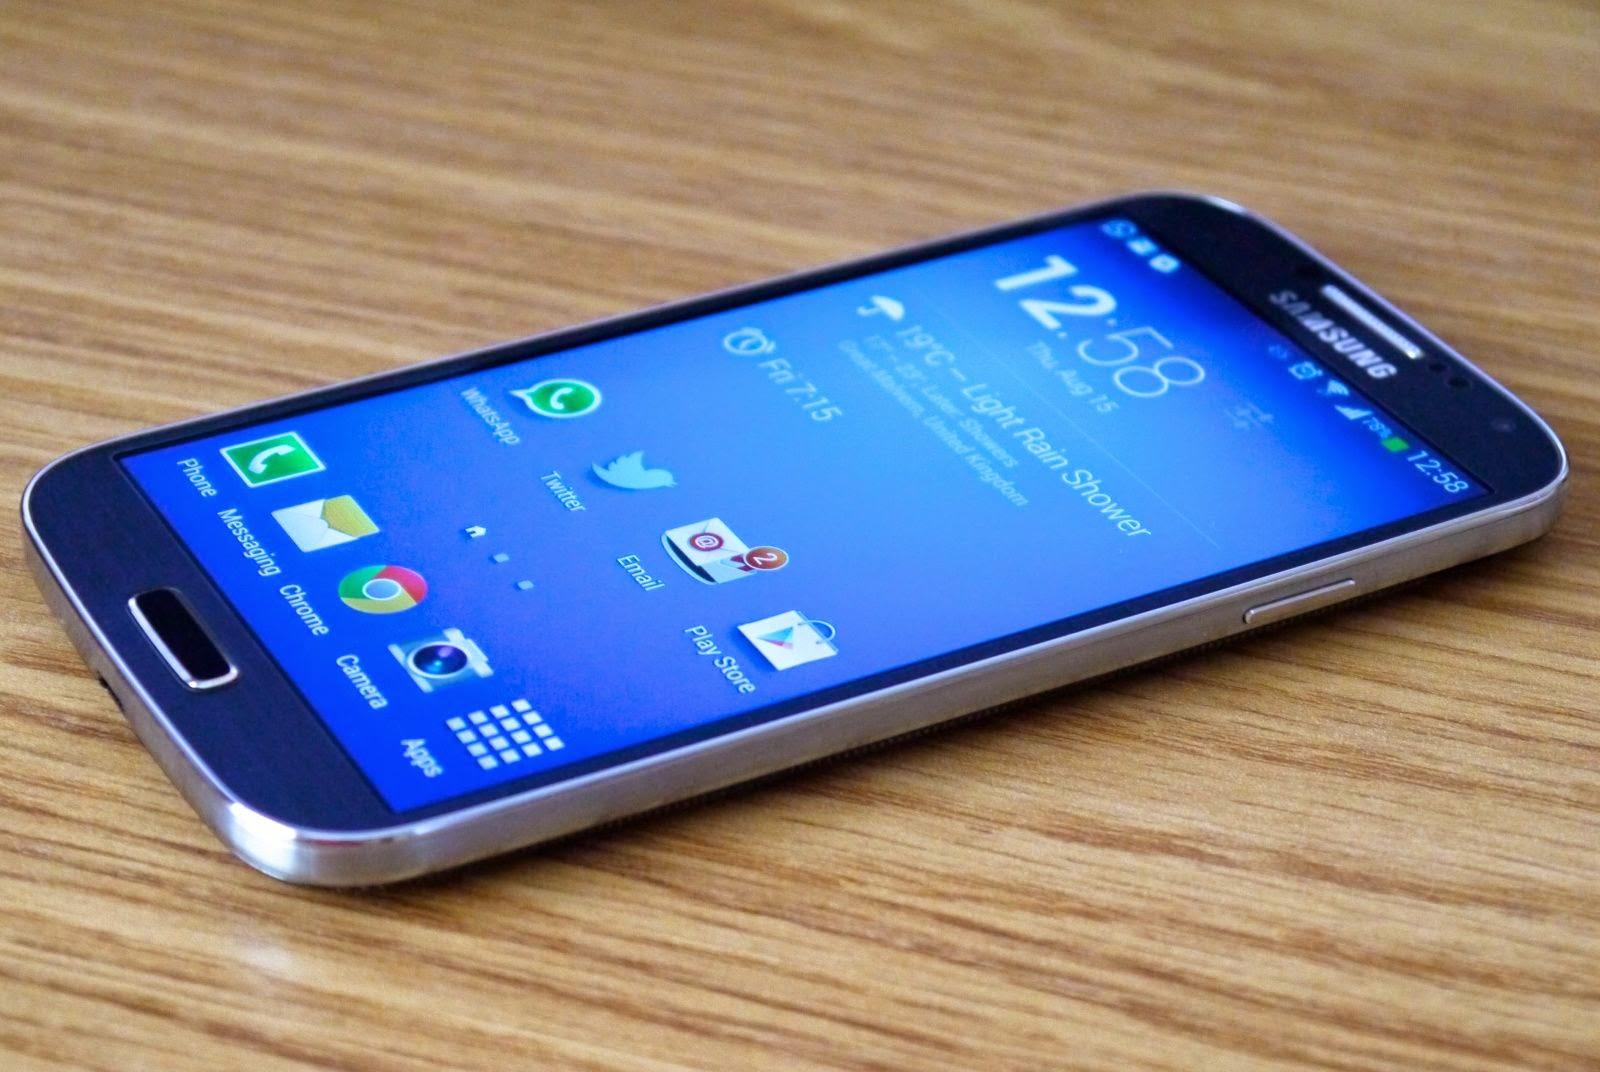 3 Perbedaan Menonjol Samsung Galaxy S5 Asli Dan Supercopy